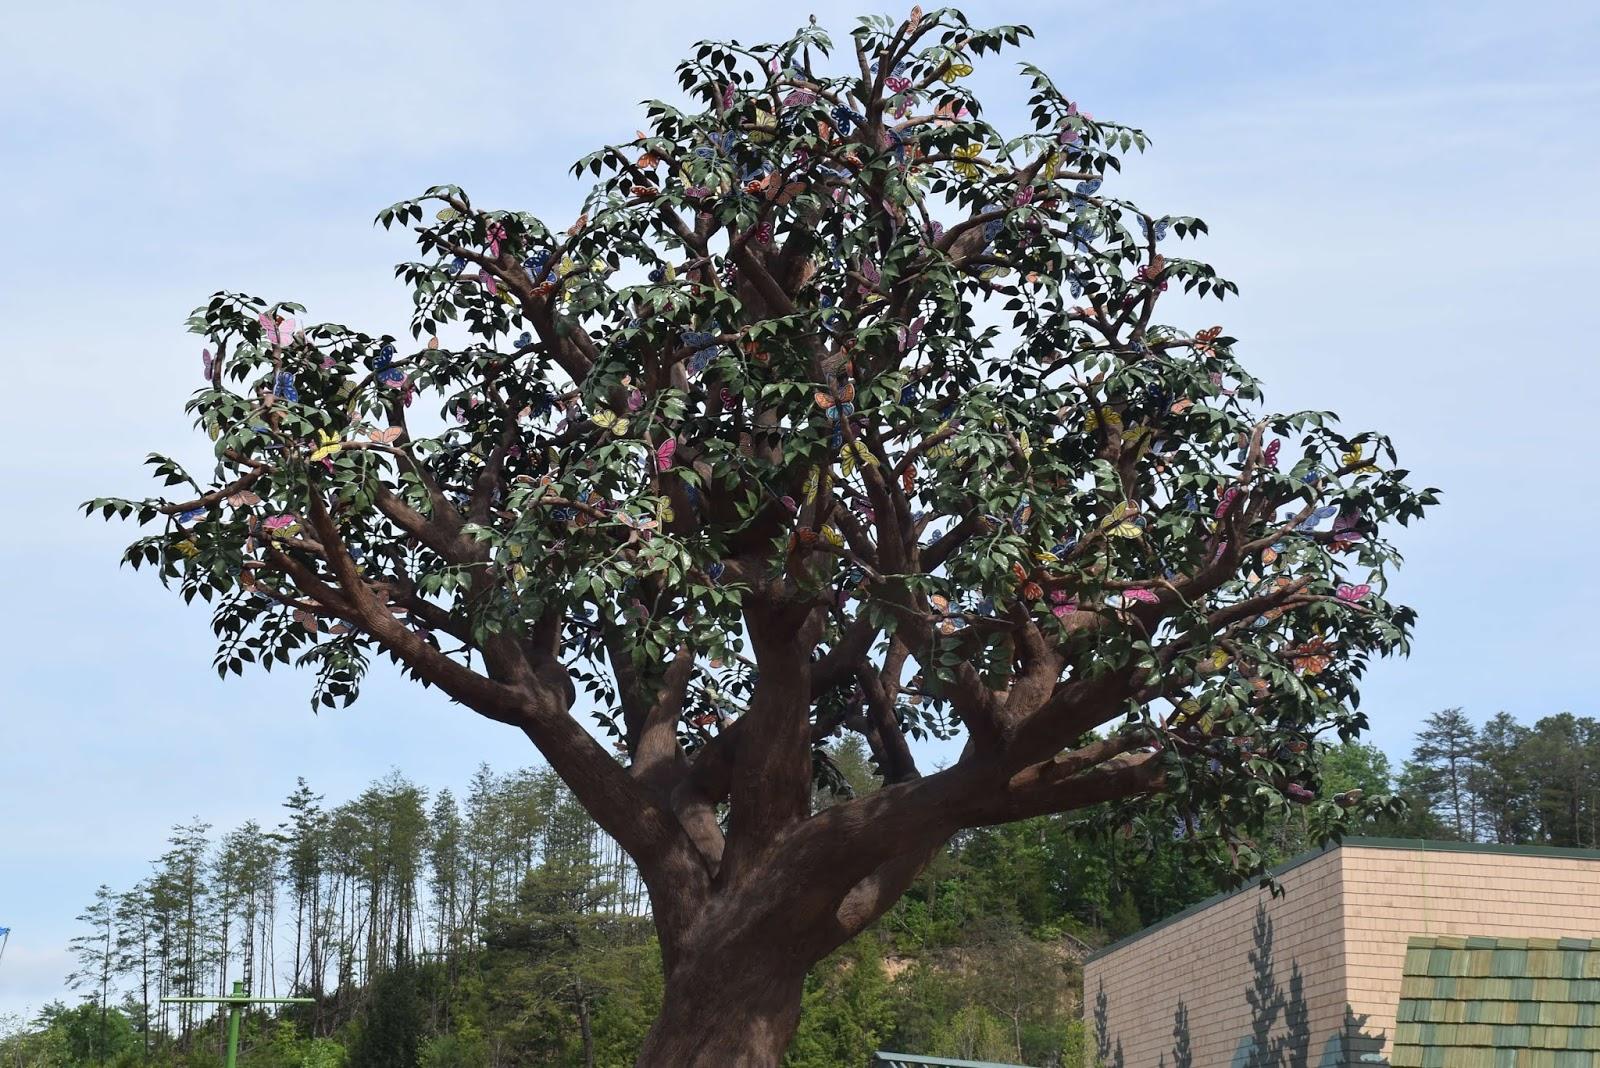 Wildwood Tree at Wildwood Grove inside of Dollywood